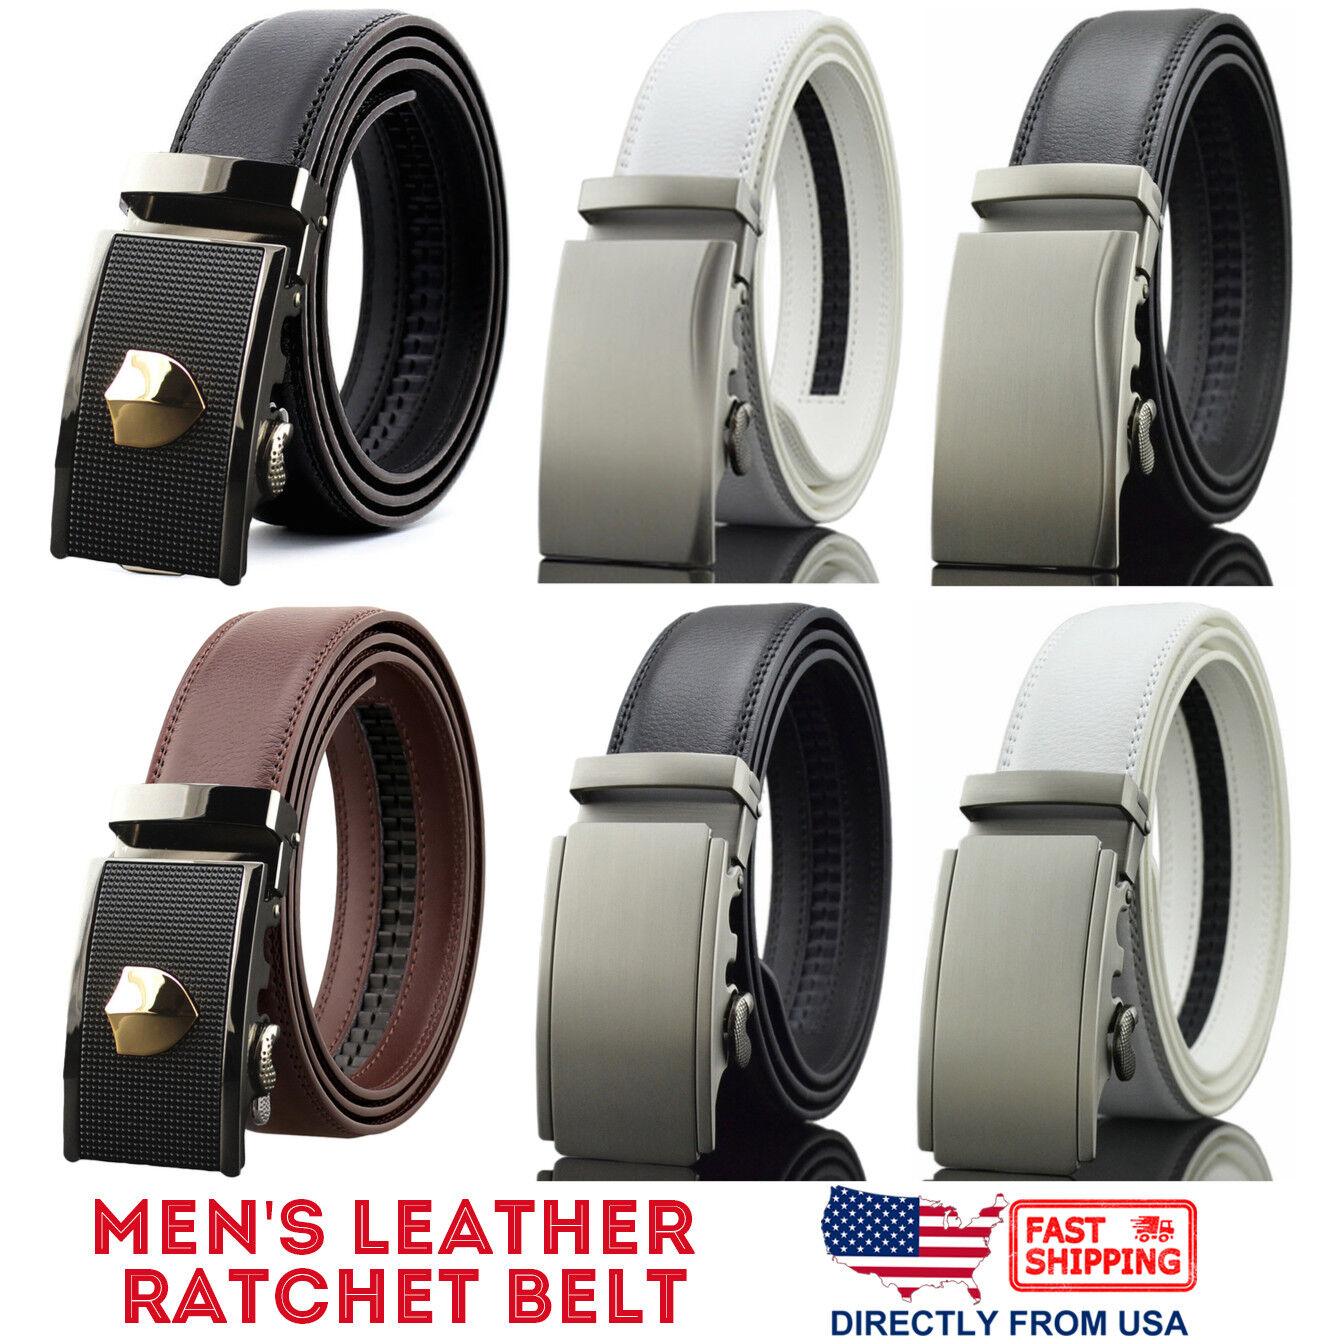 Men's Genuine Leather Adjustable Automatic Buckle Ratchet Business Dress Belt Belts